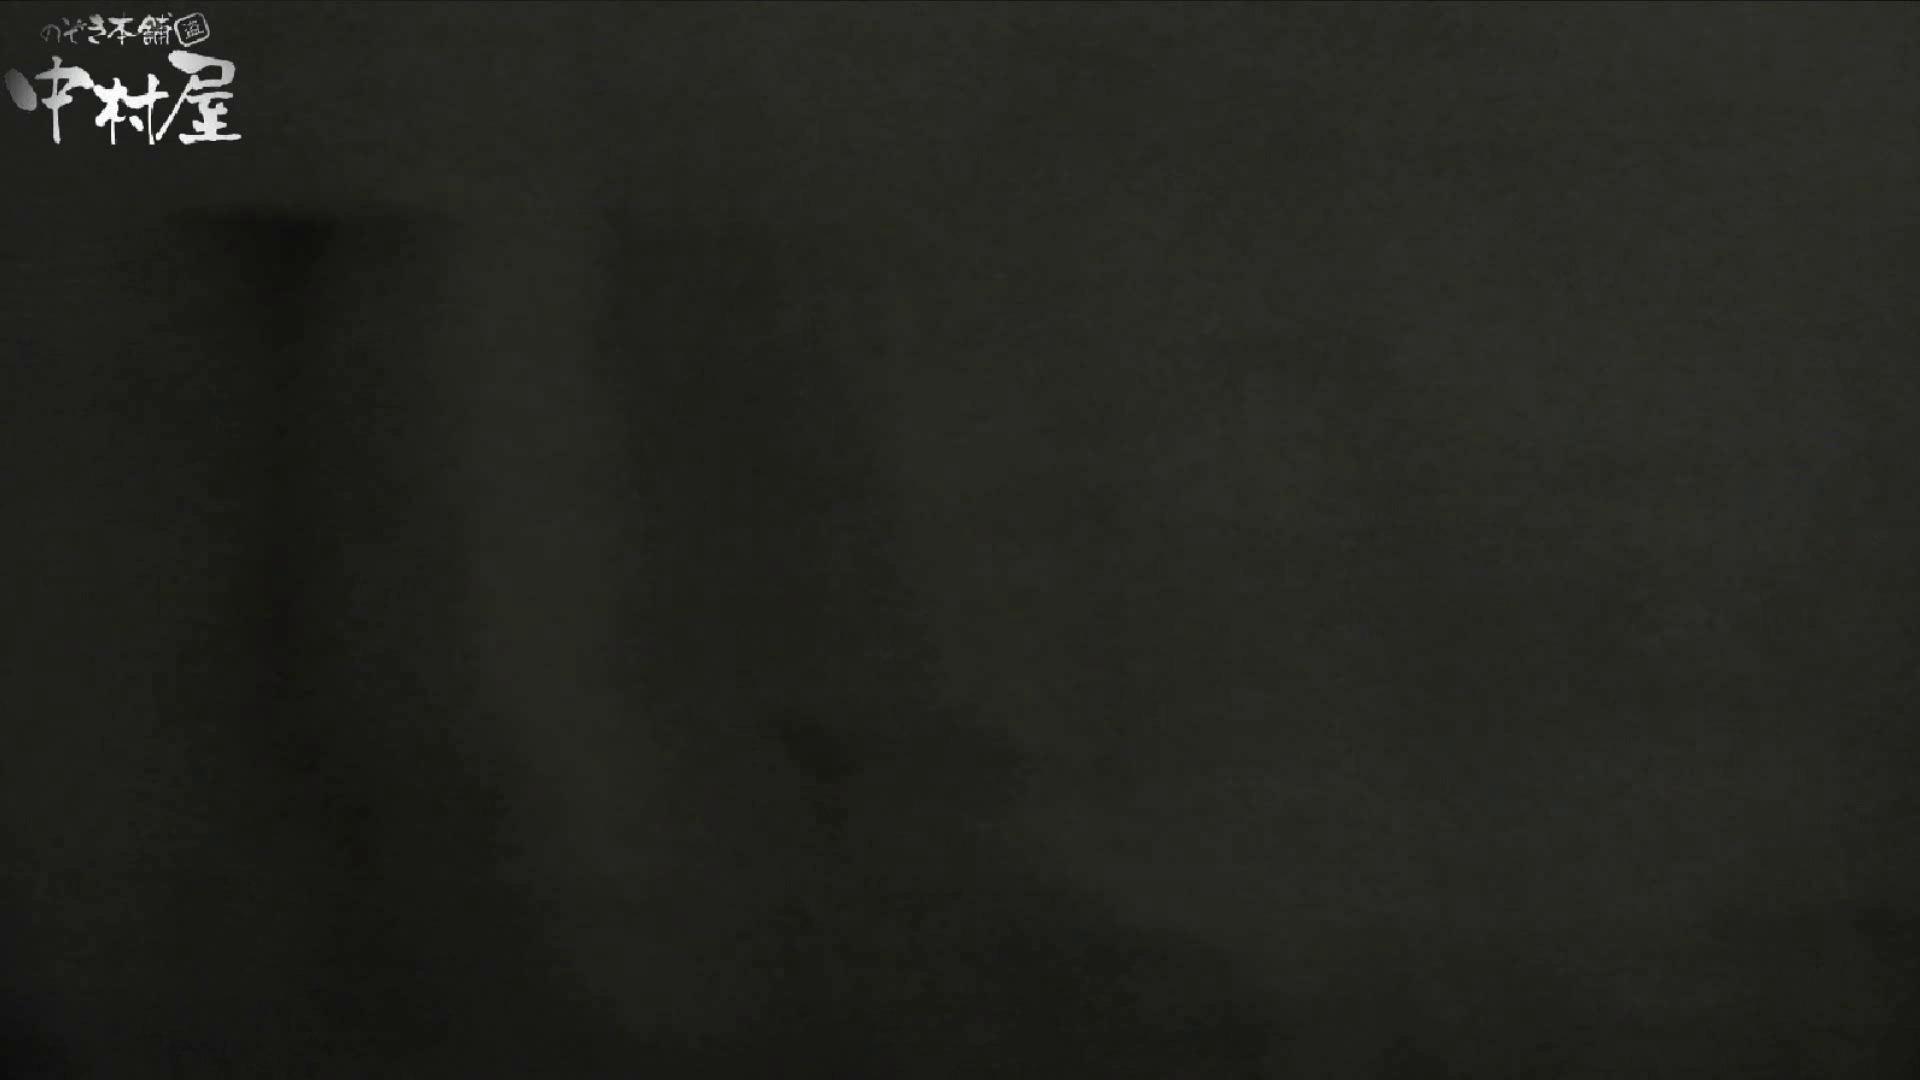 vol.25 命がけ潜伏洗面所! 咥えタオルは剛毛の証!? プライベート アダルト動画キャプチャ 72pic 63